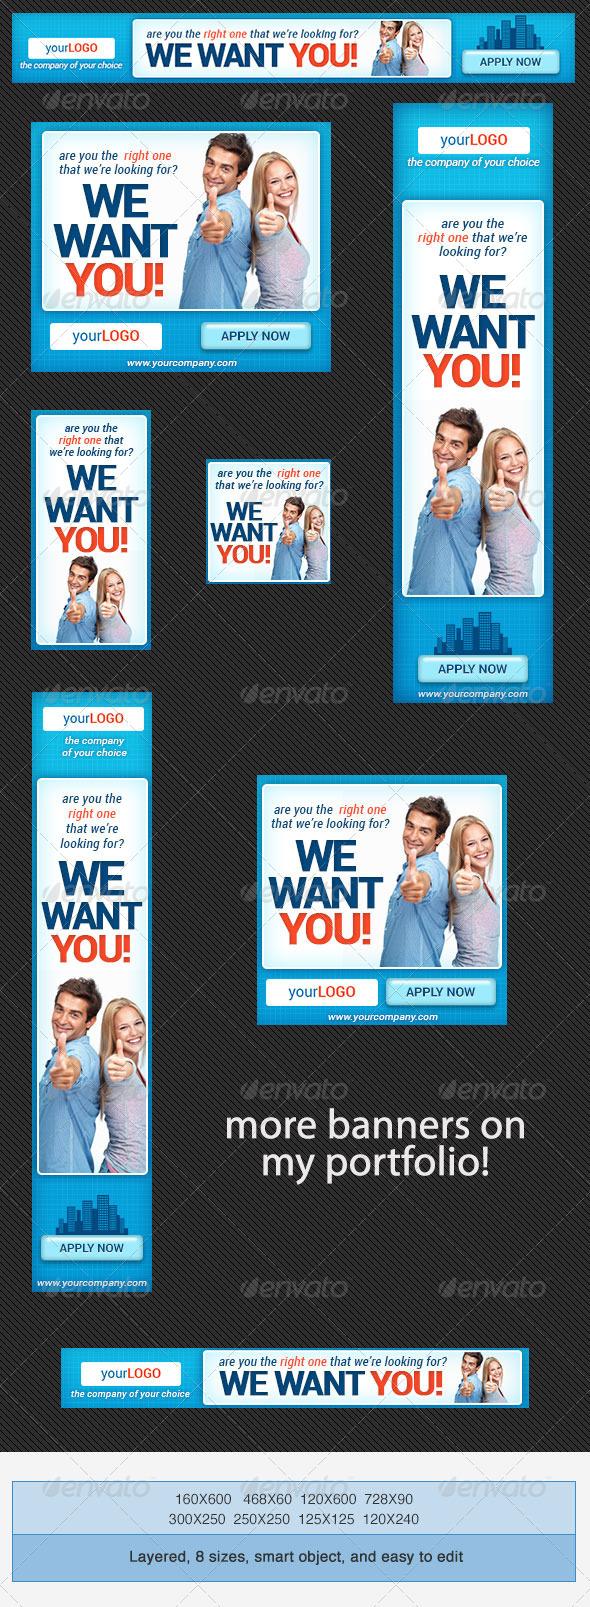 hiring ad template.html